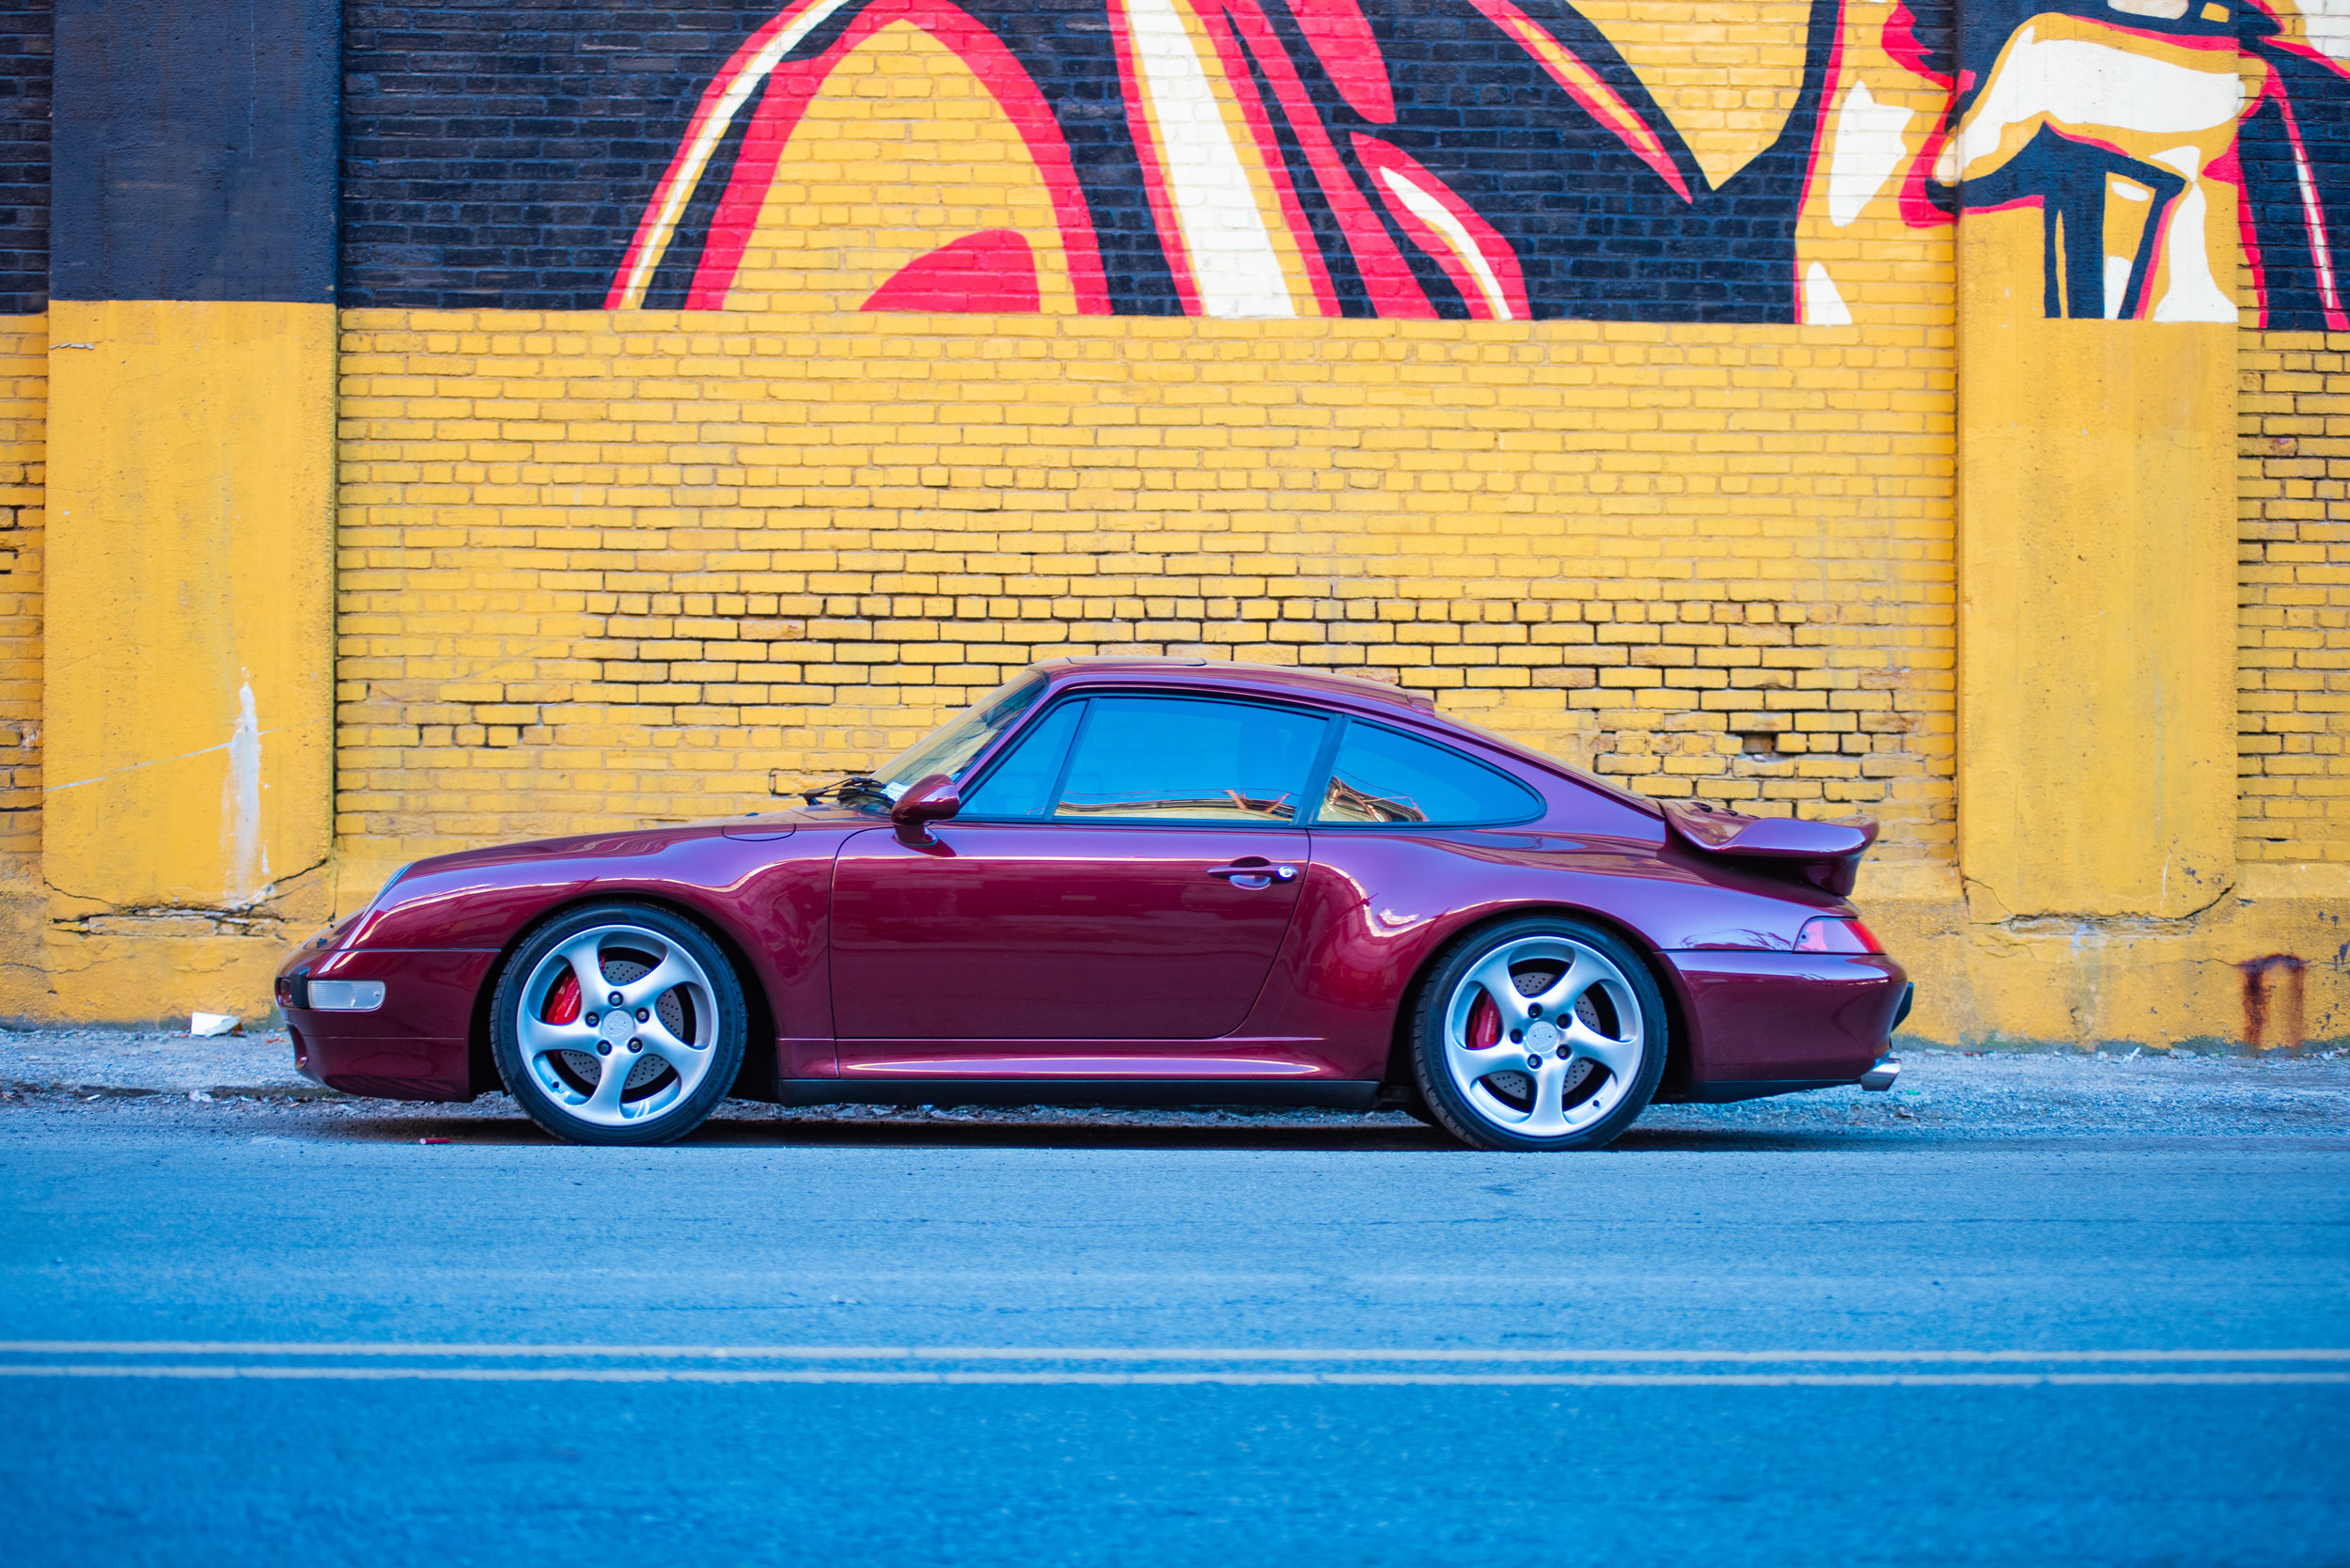 1996 Porsche 993 4S - Sold February 22, 2019